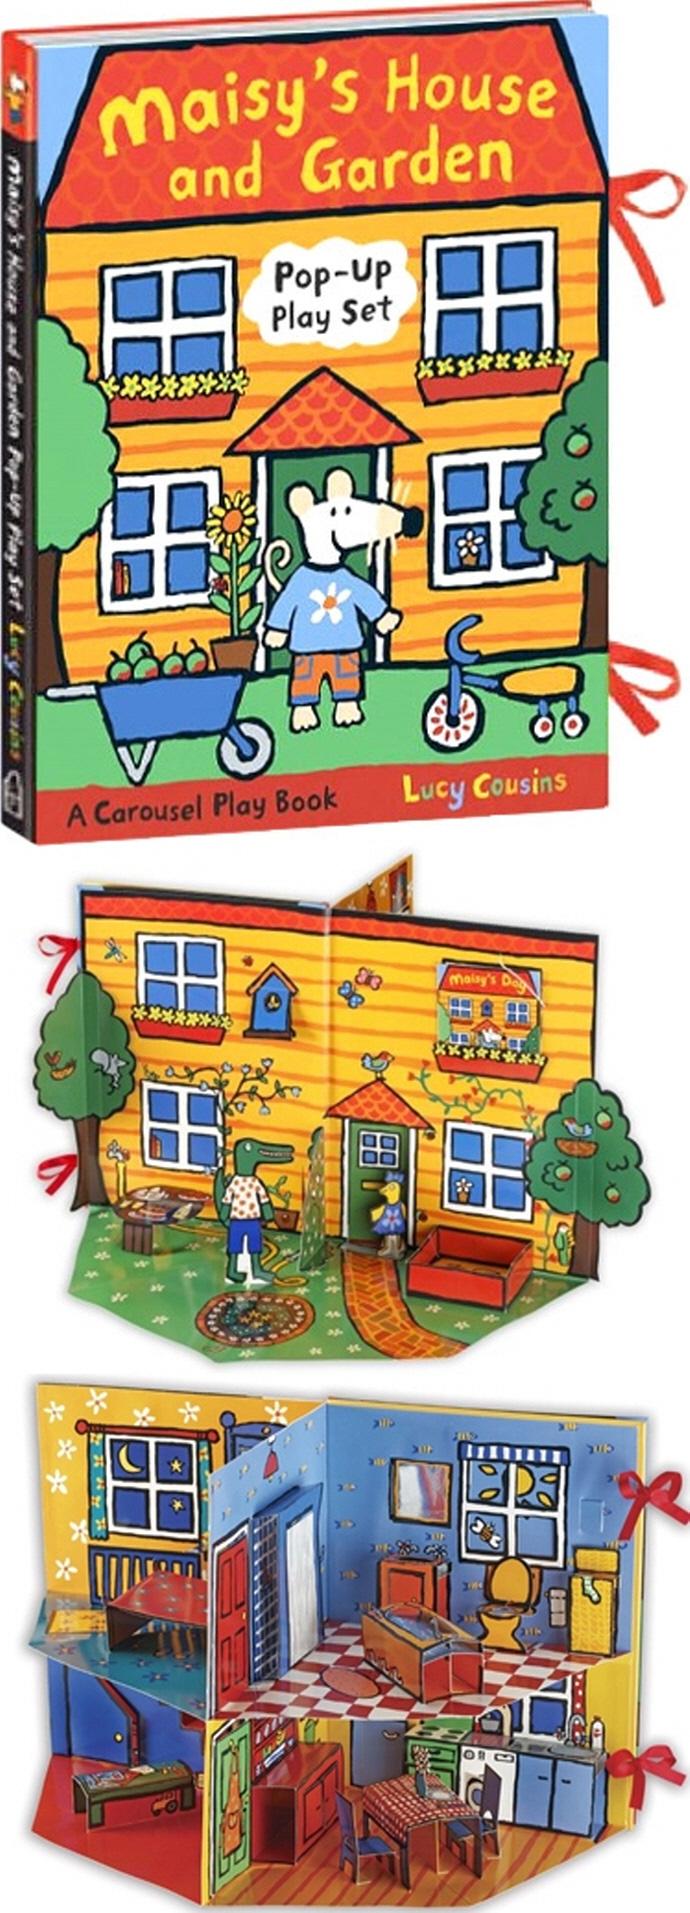 Maisy's House and Garden 메이지 하우스 앤 가든 팝업북 도서 상세이미지